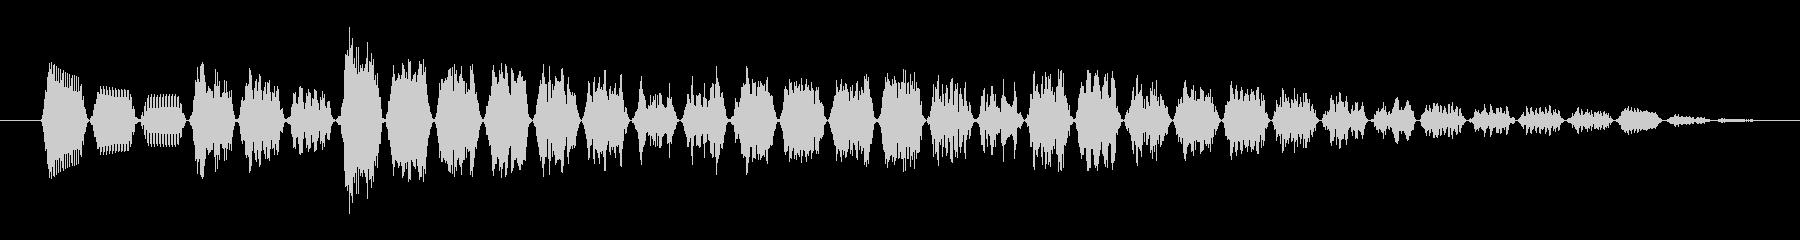 KANT近未来アラームサウンド242の未再生の波形